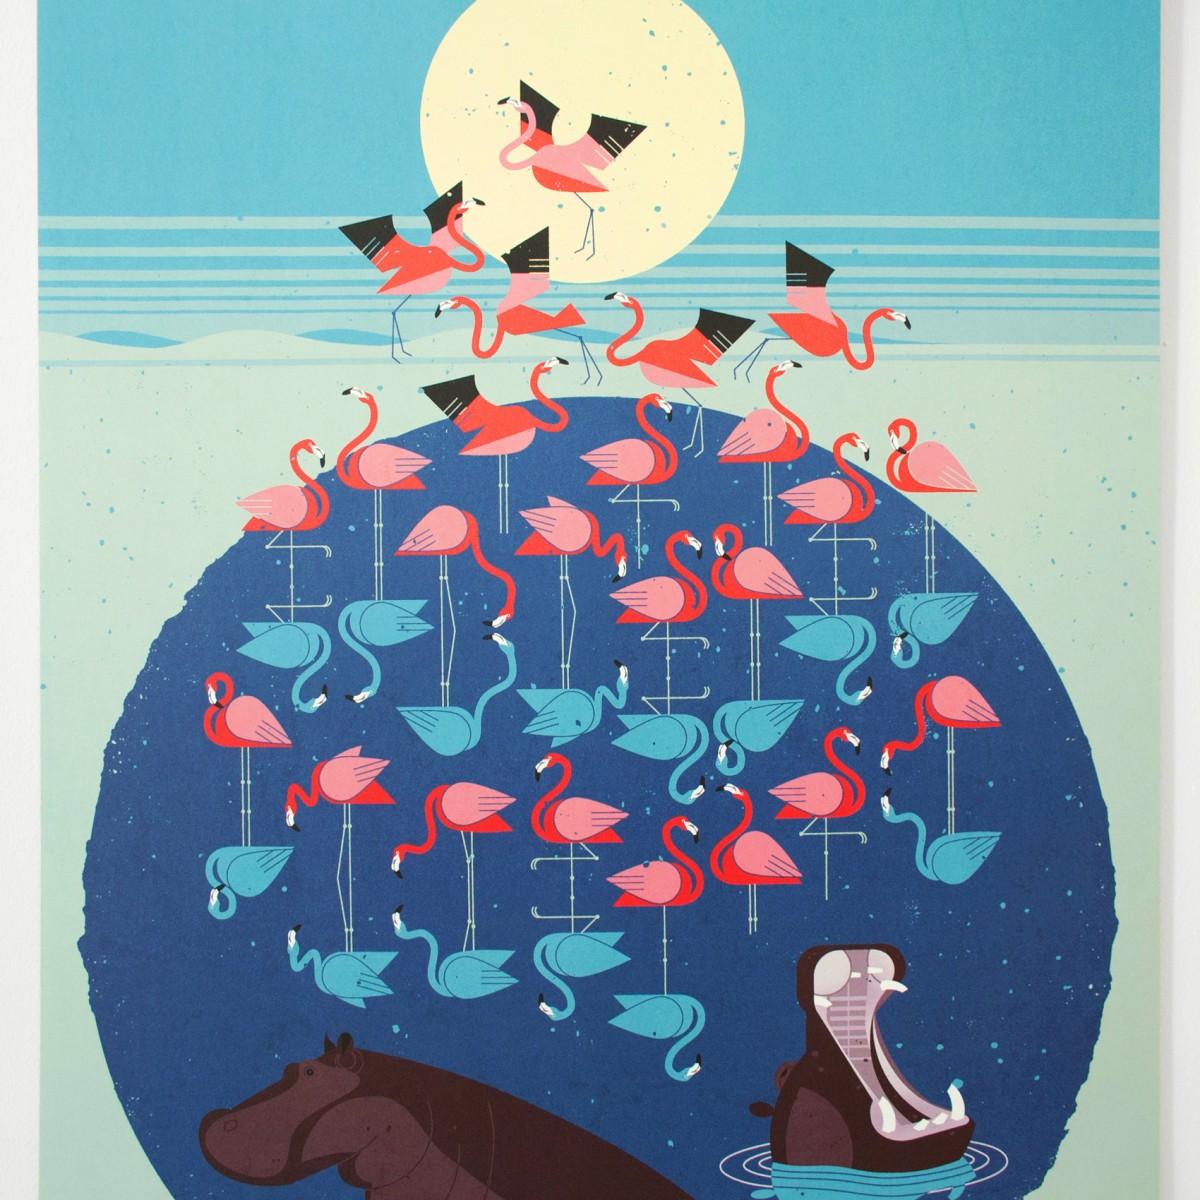 KLEINWAREN / VON LAUFENBERG Set / Flamingo Lake + Posterleiste Eiche 50 cm